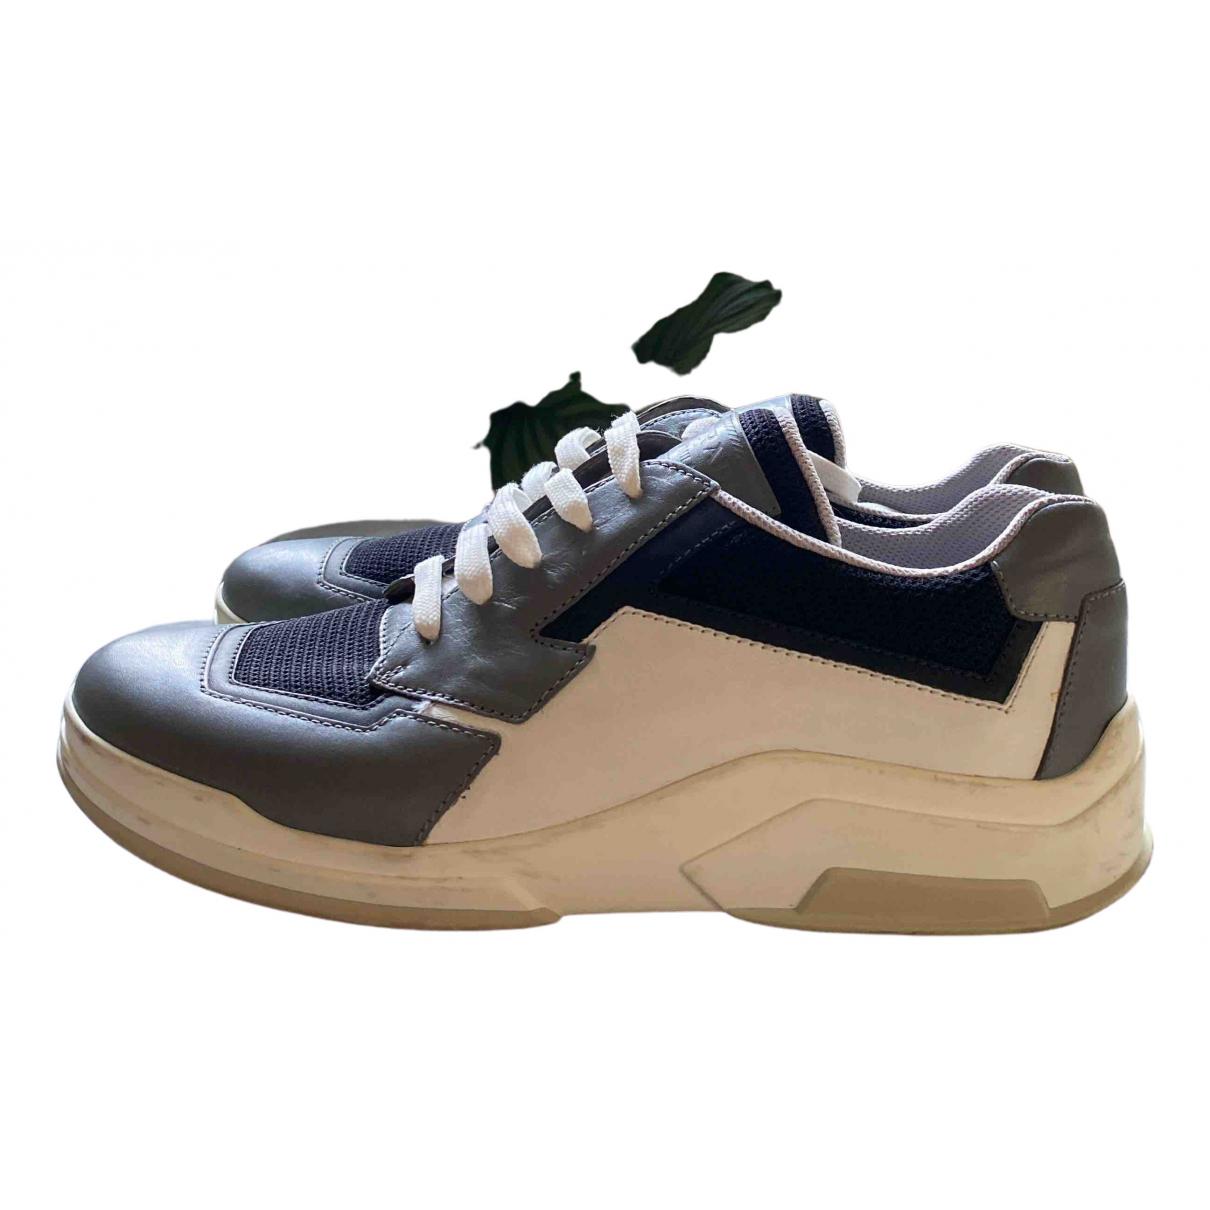 Prada \N Grey Leather Trainers for Women 41 EU